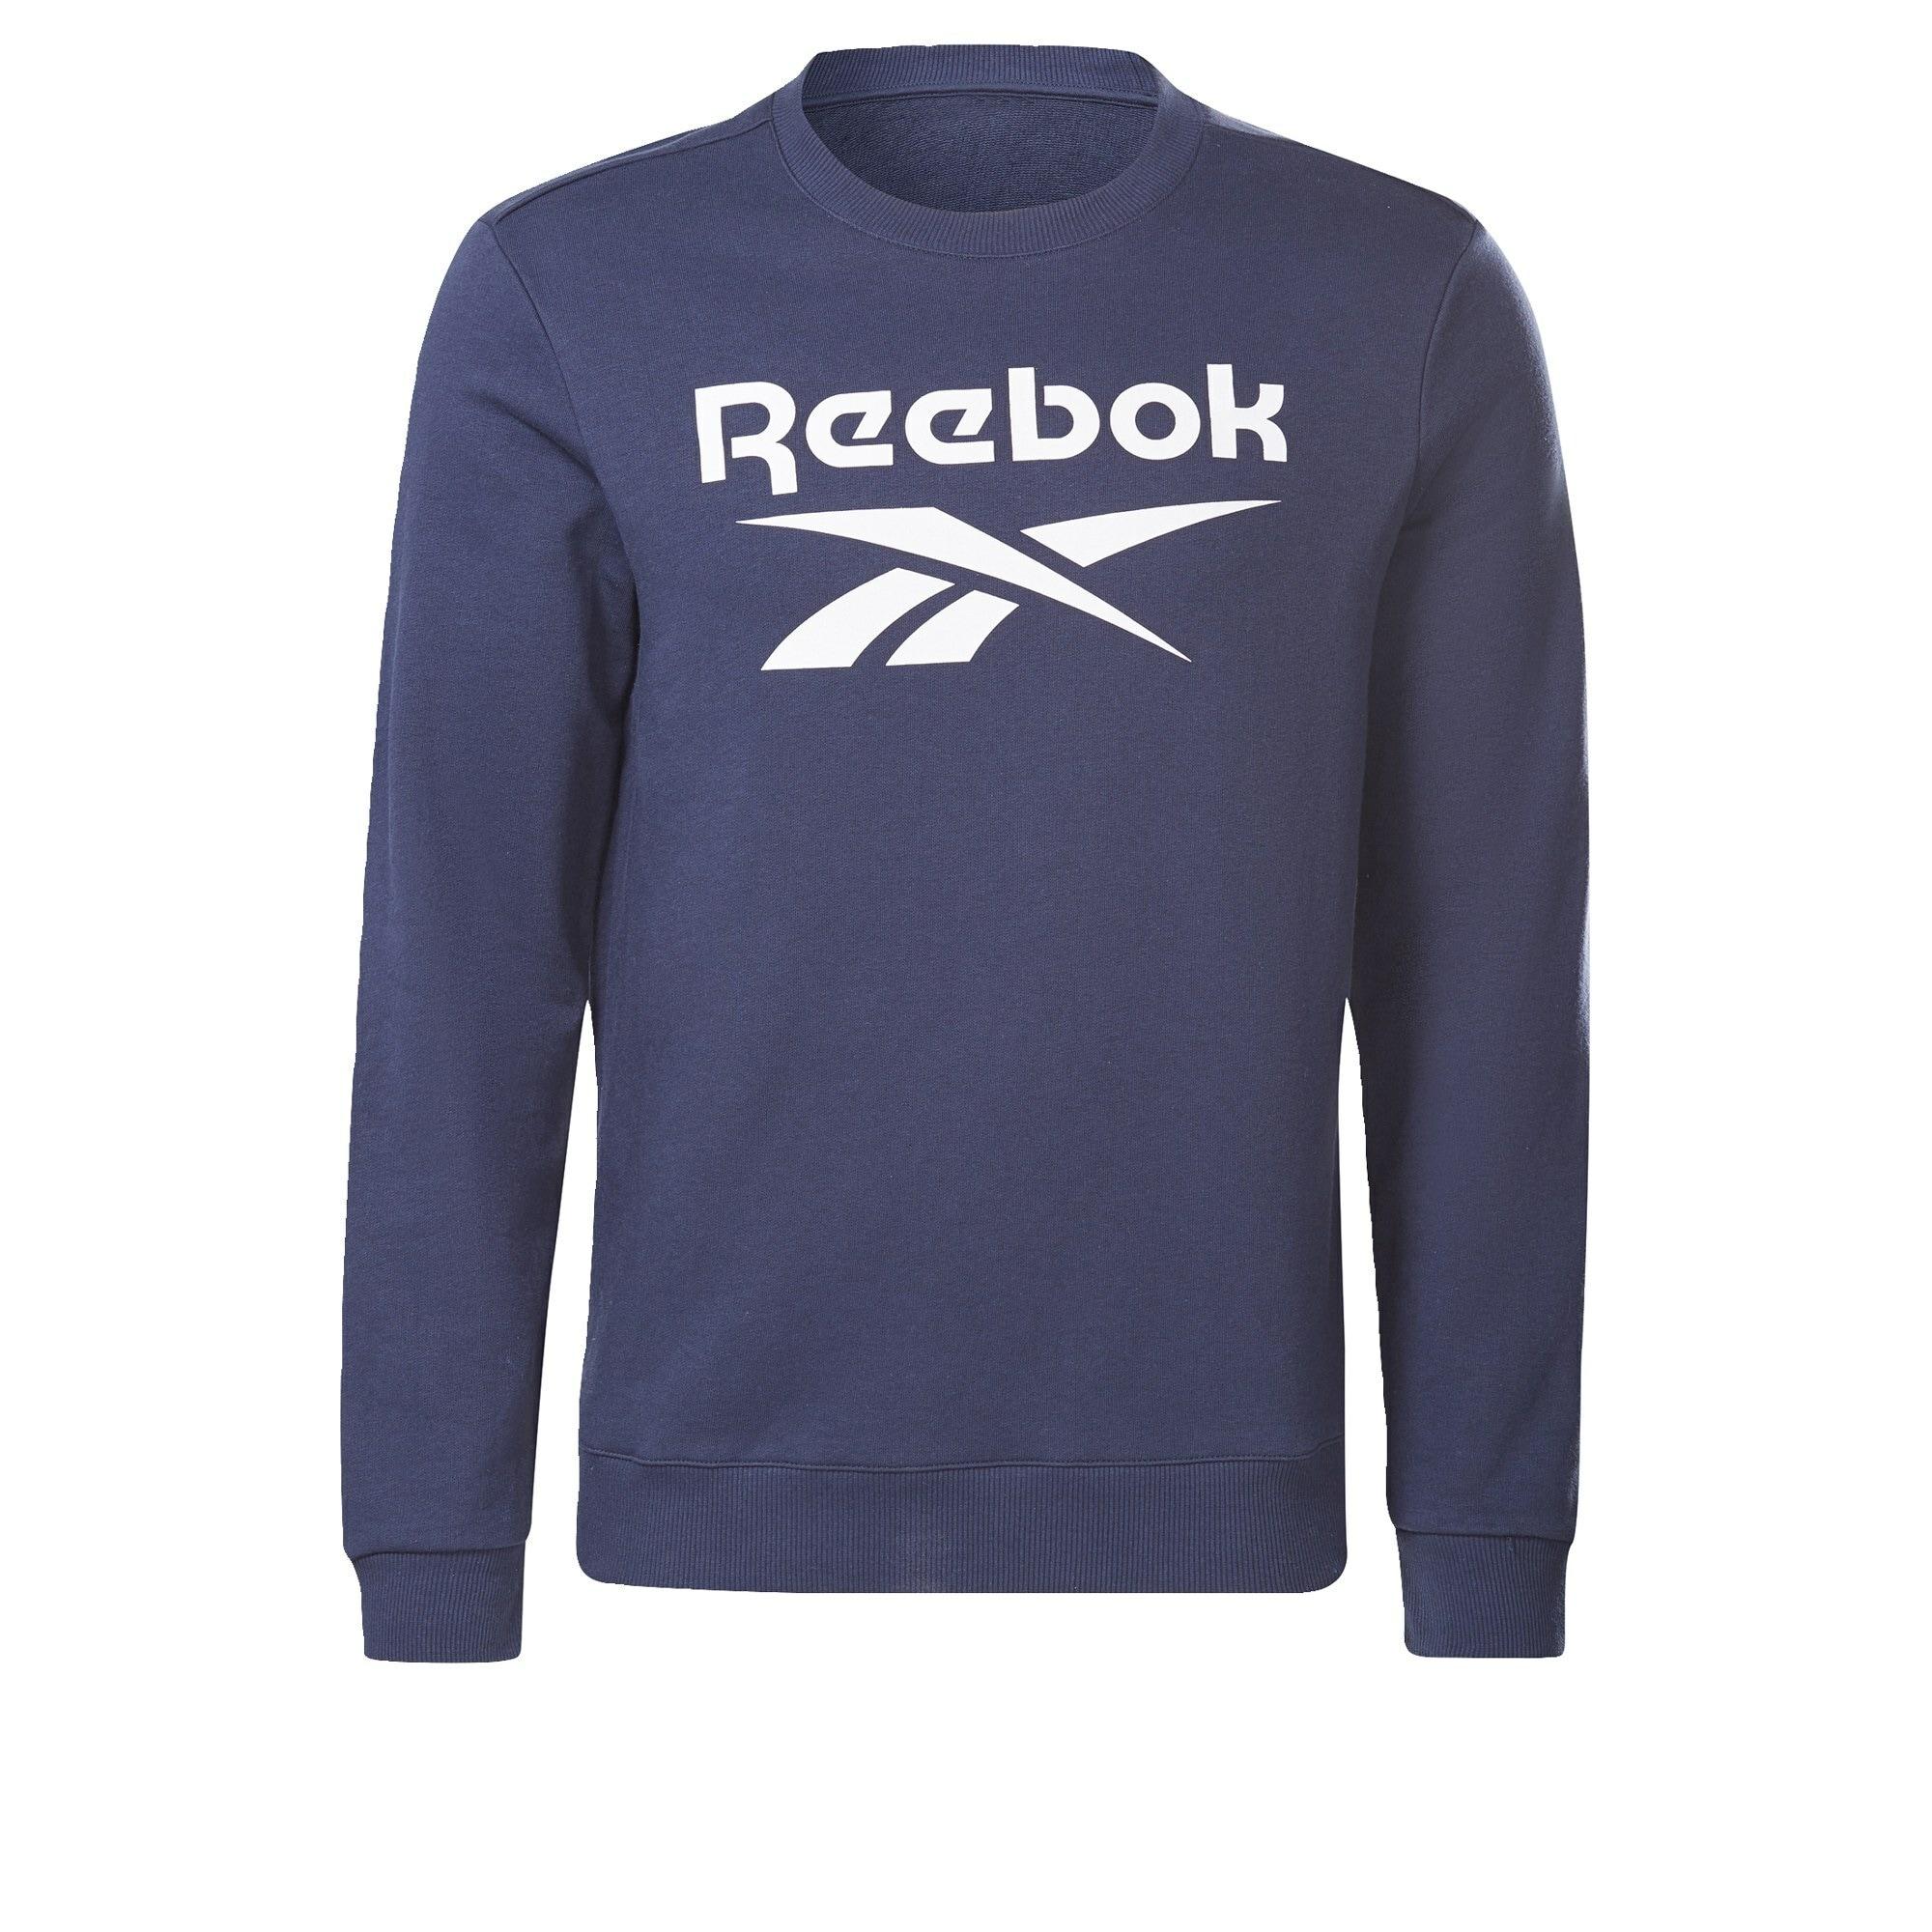 REEBOK Sportinio tipo megztinis mėlyna